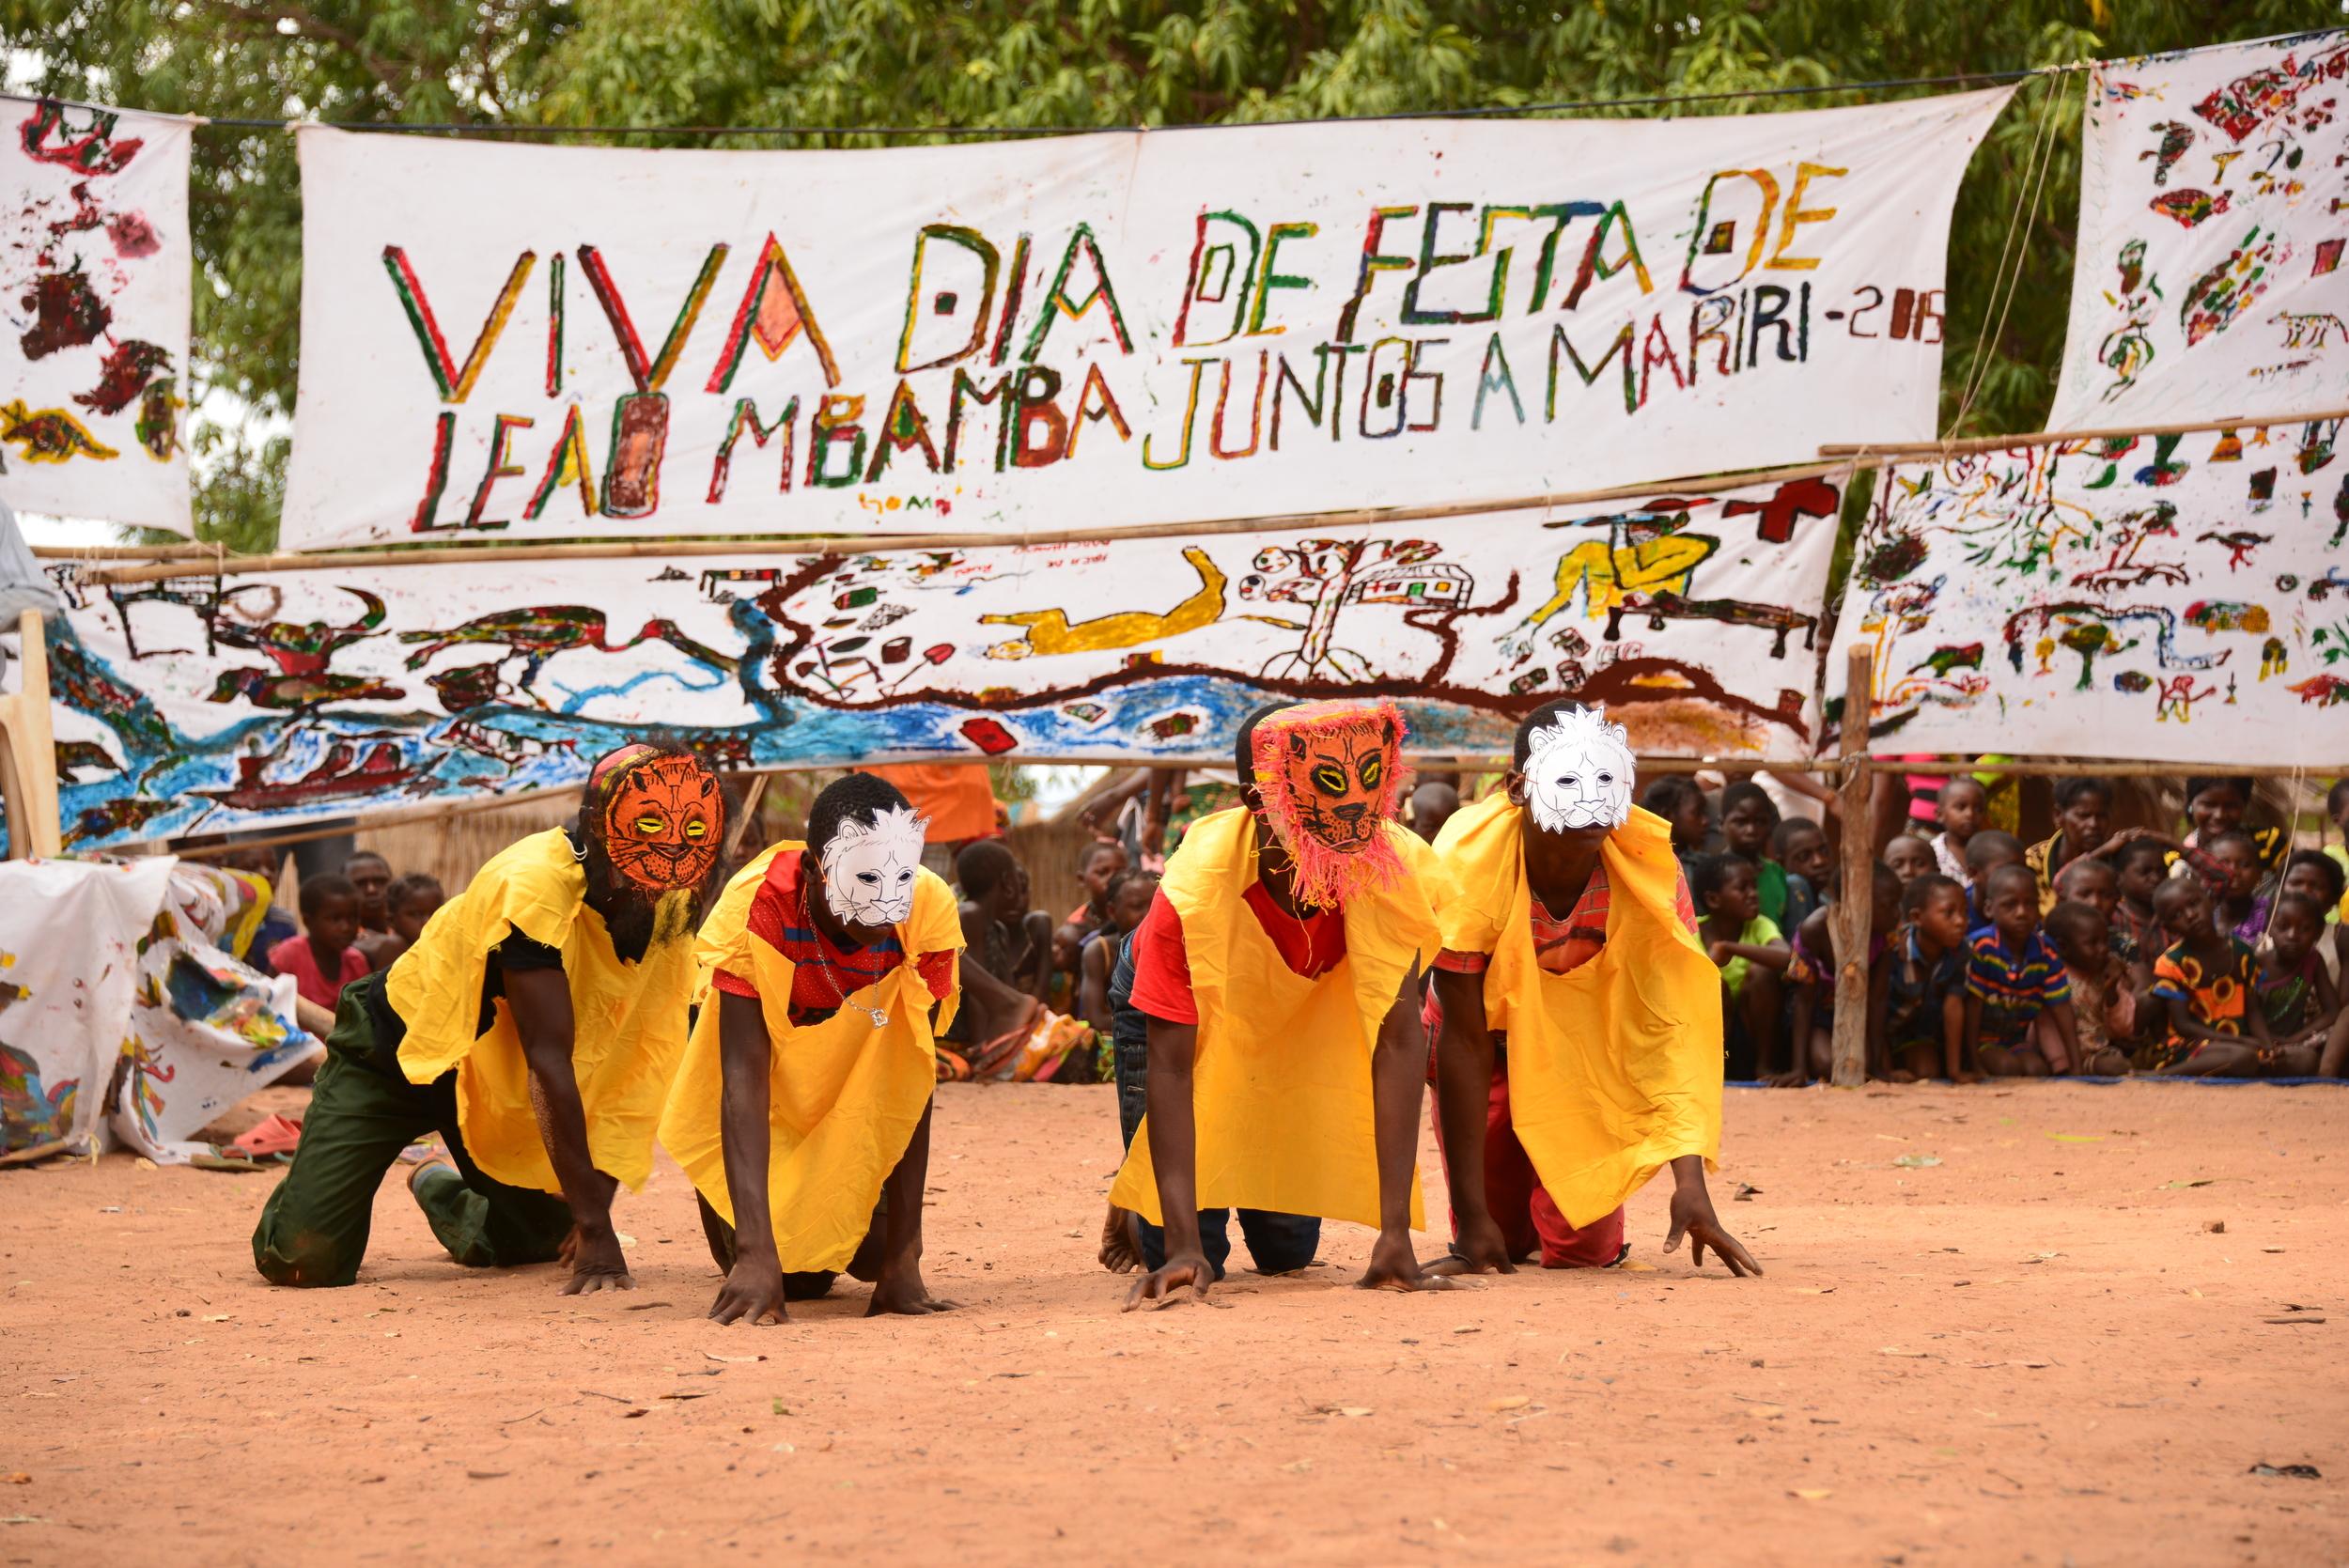 Community conservation programs at Niassa Lion Project